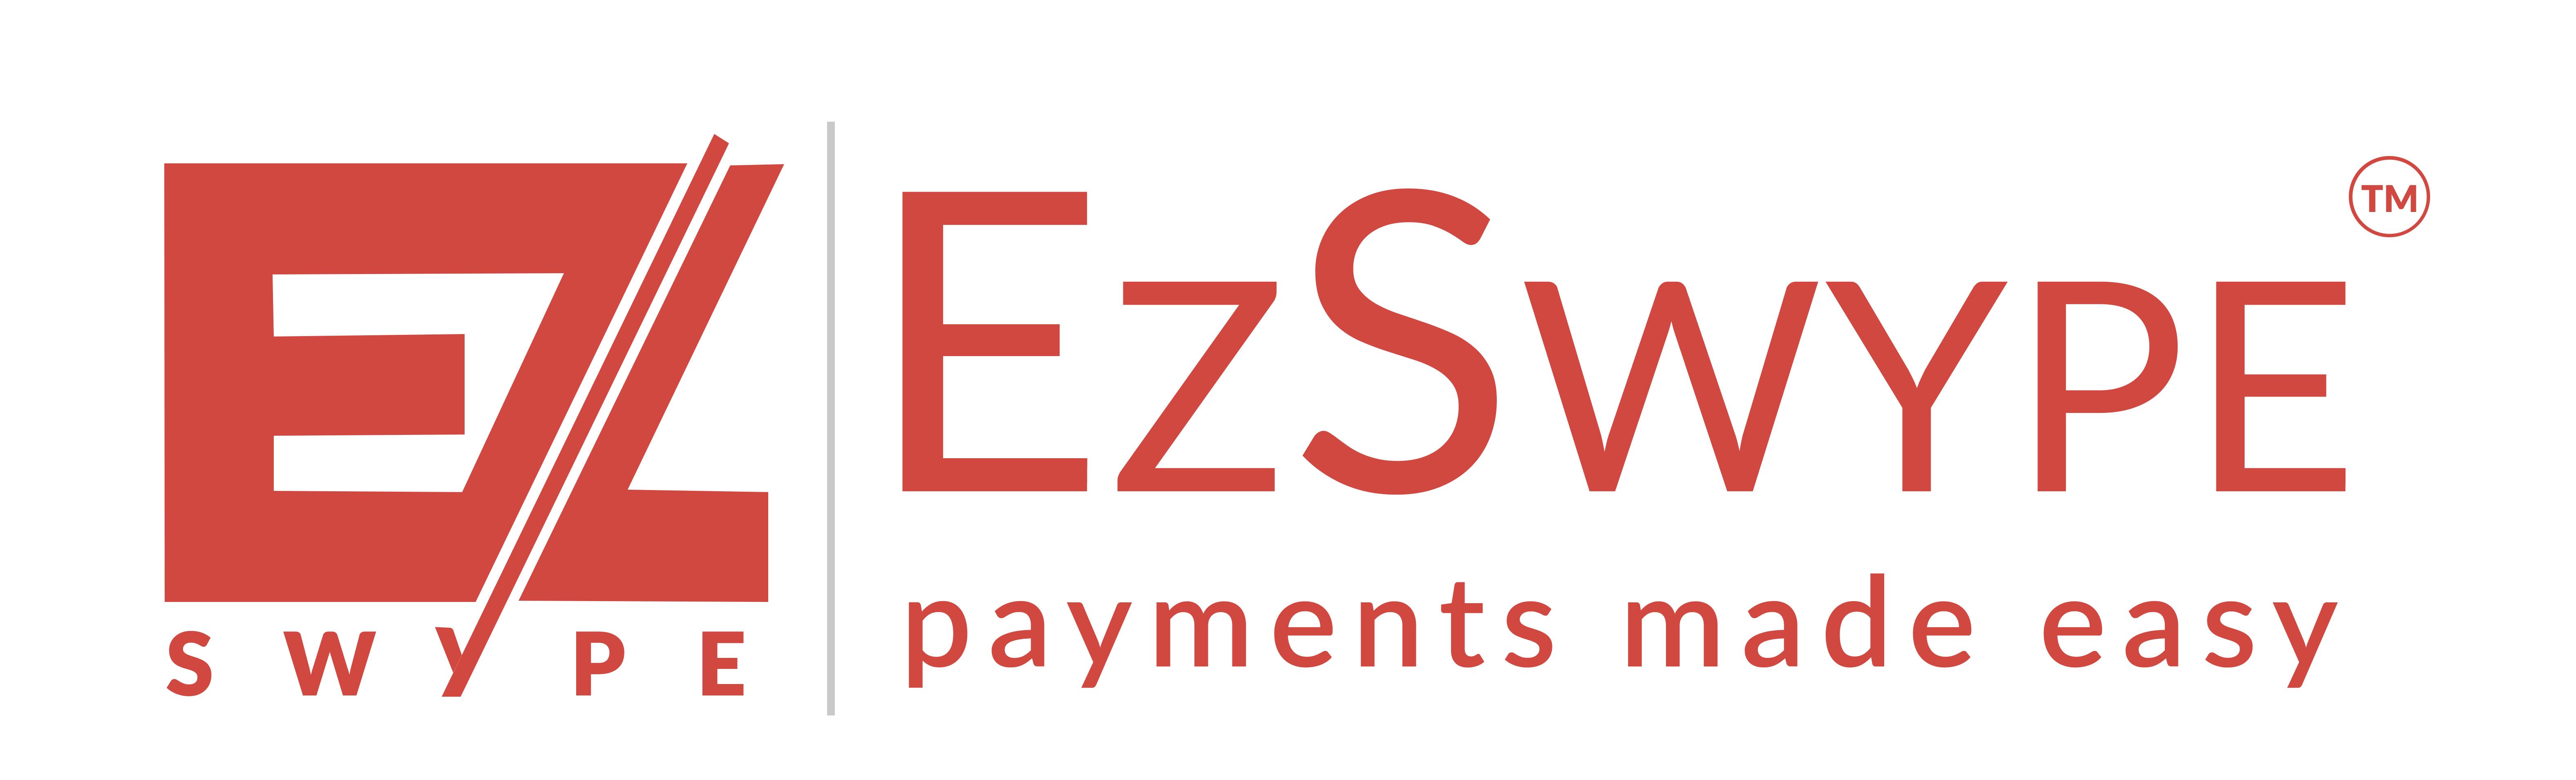 Ezswype Blog